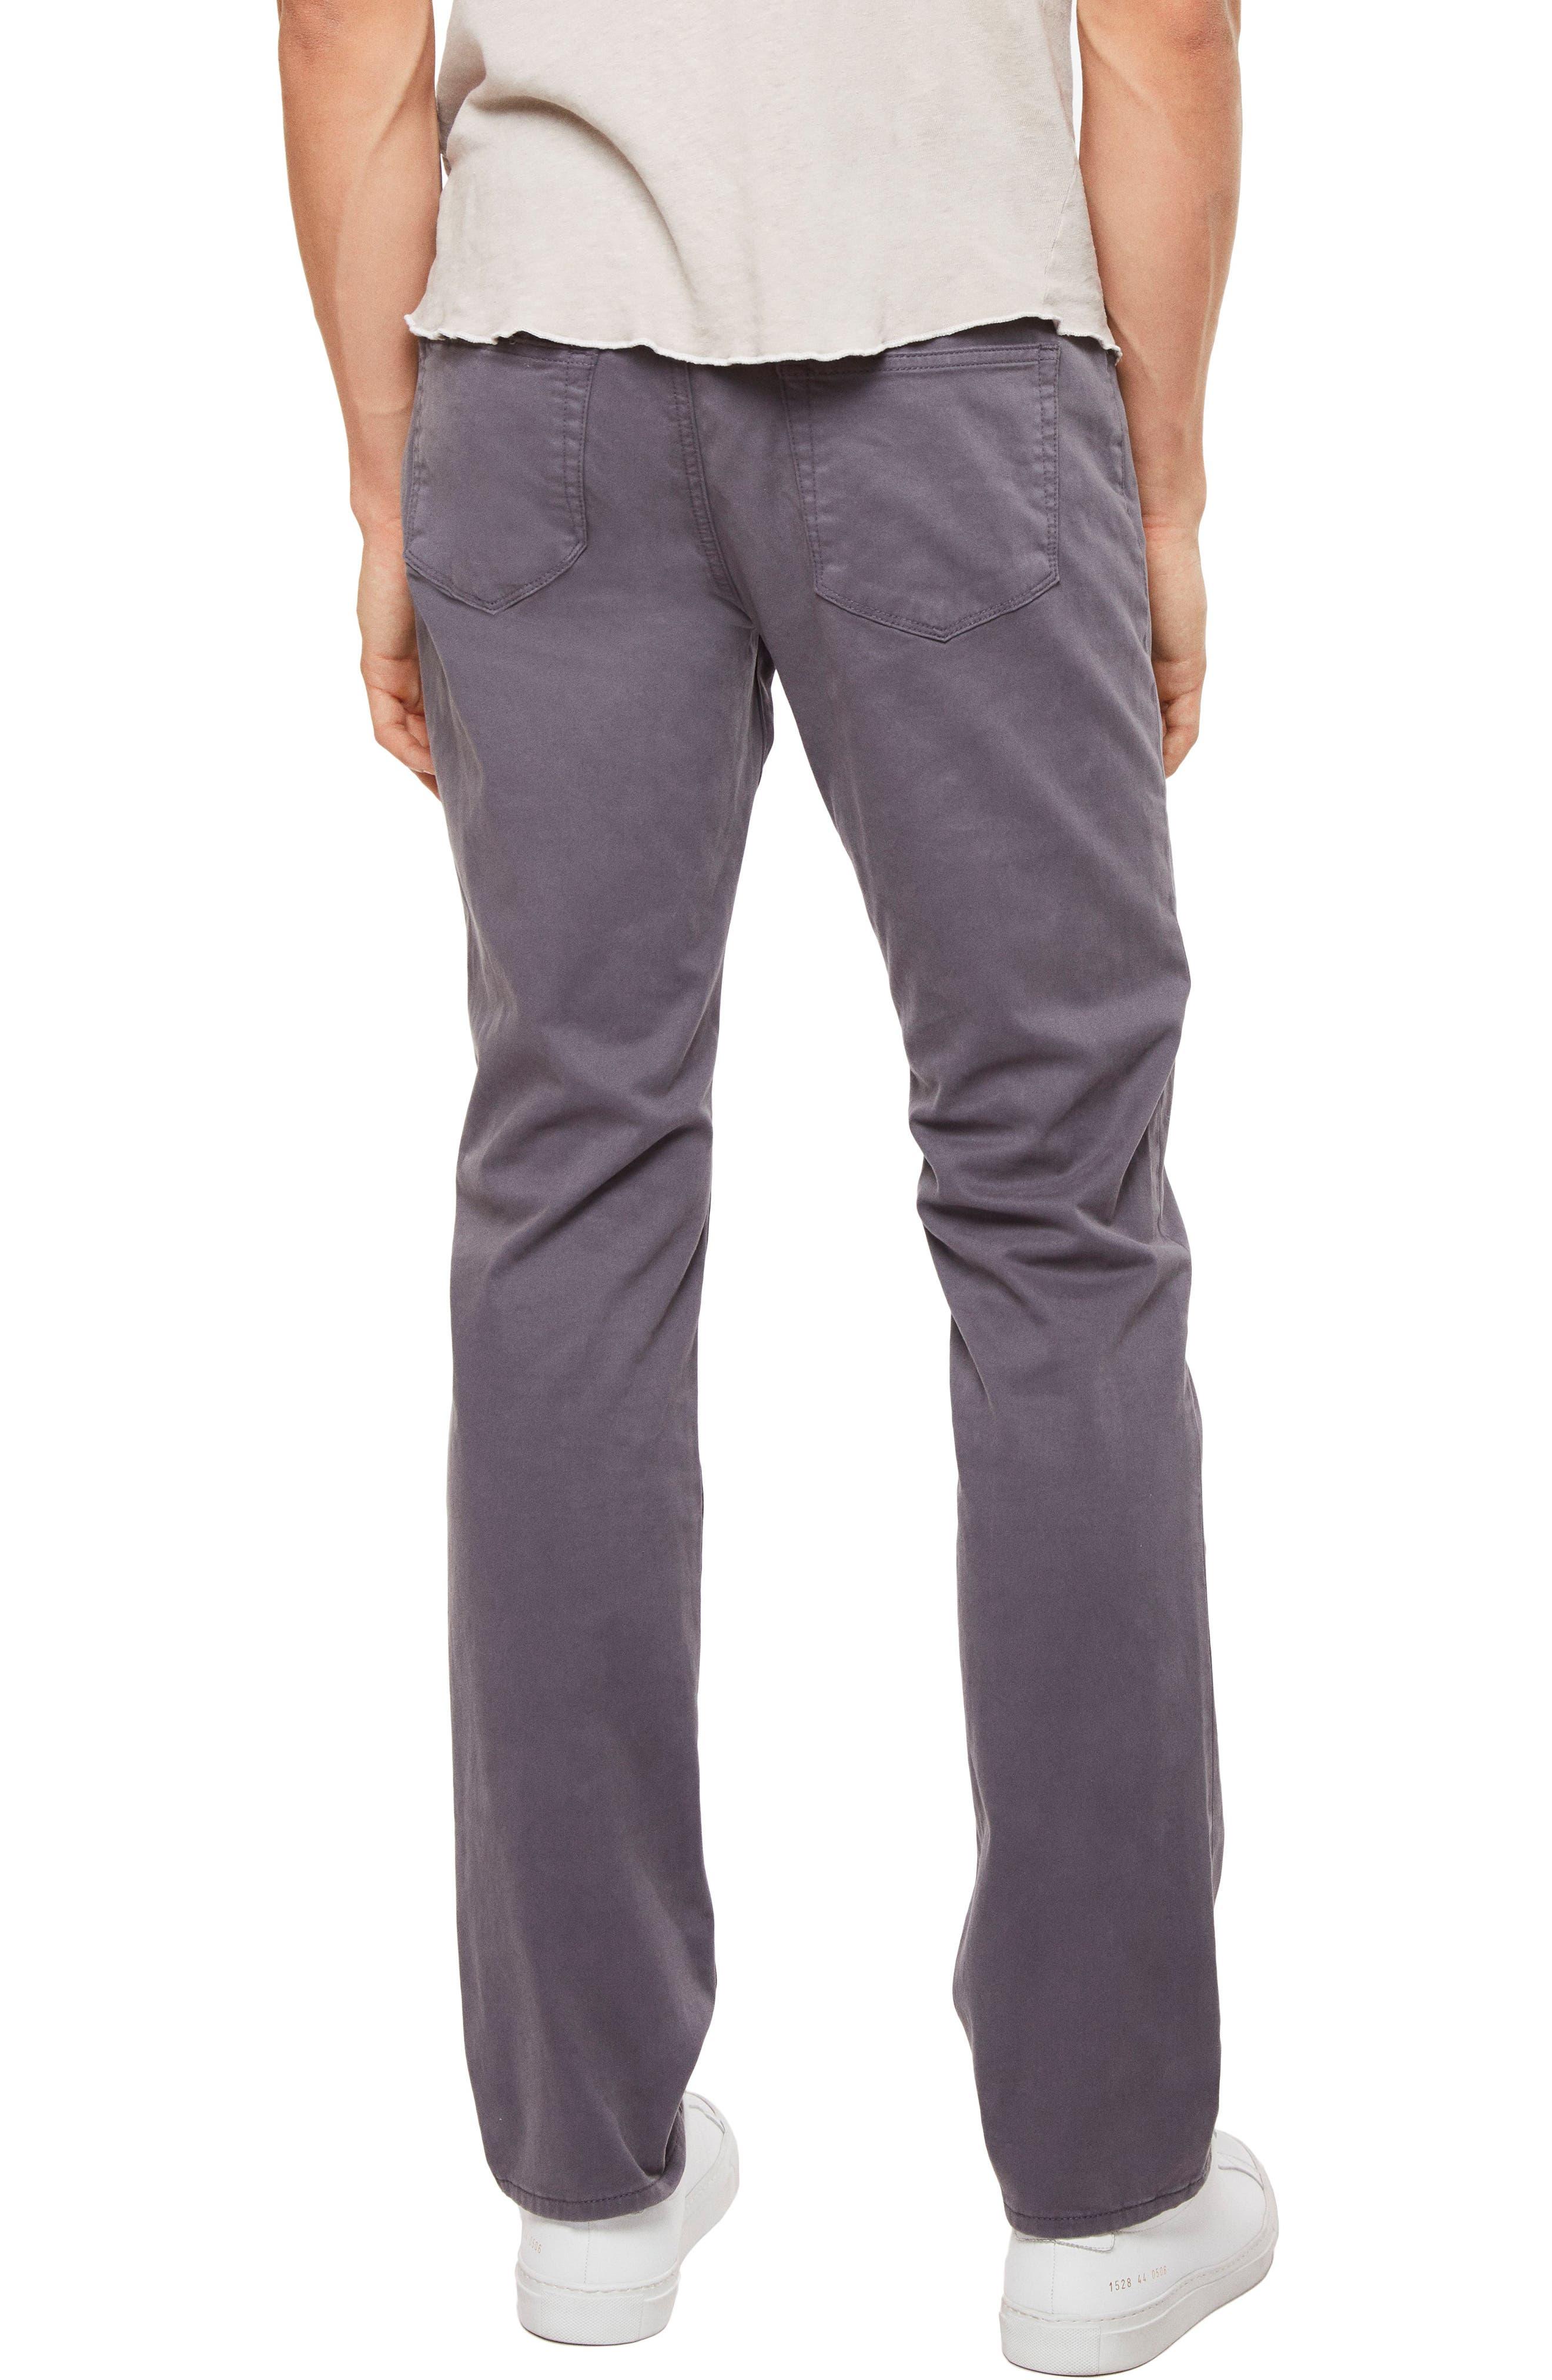 'Kane' Slim Fit Cotton Twill Pants,                             Alternate thumbnail 2, color,                             Graben